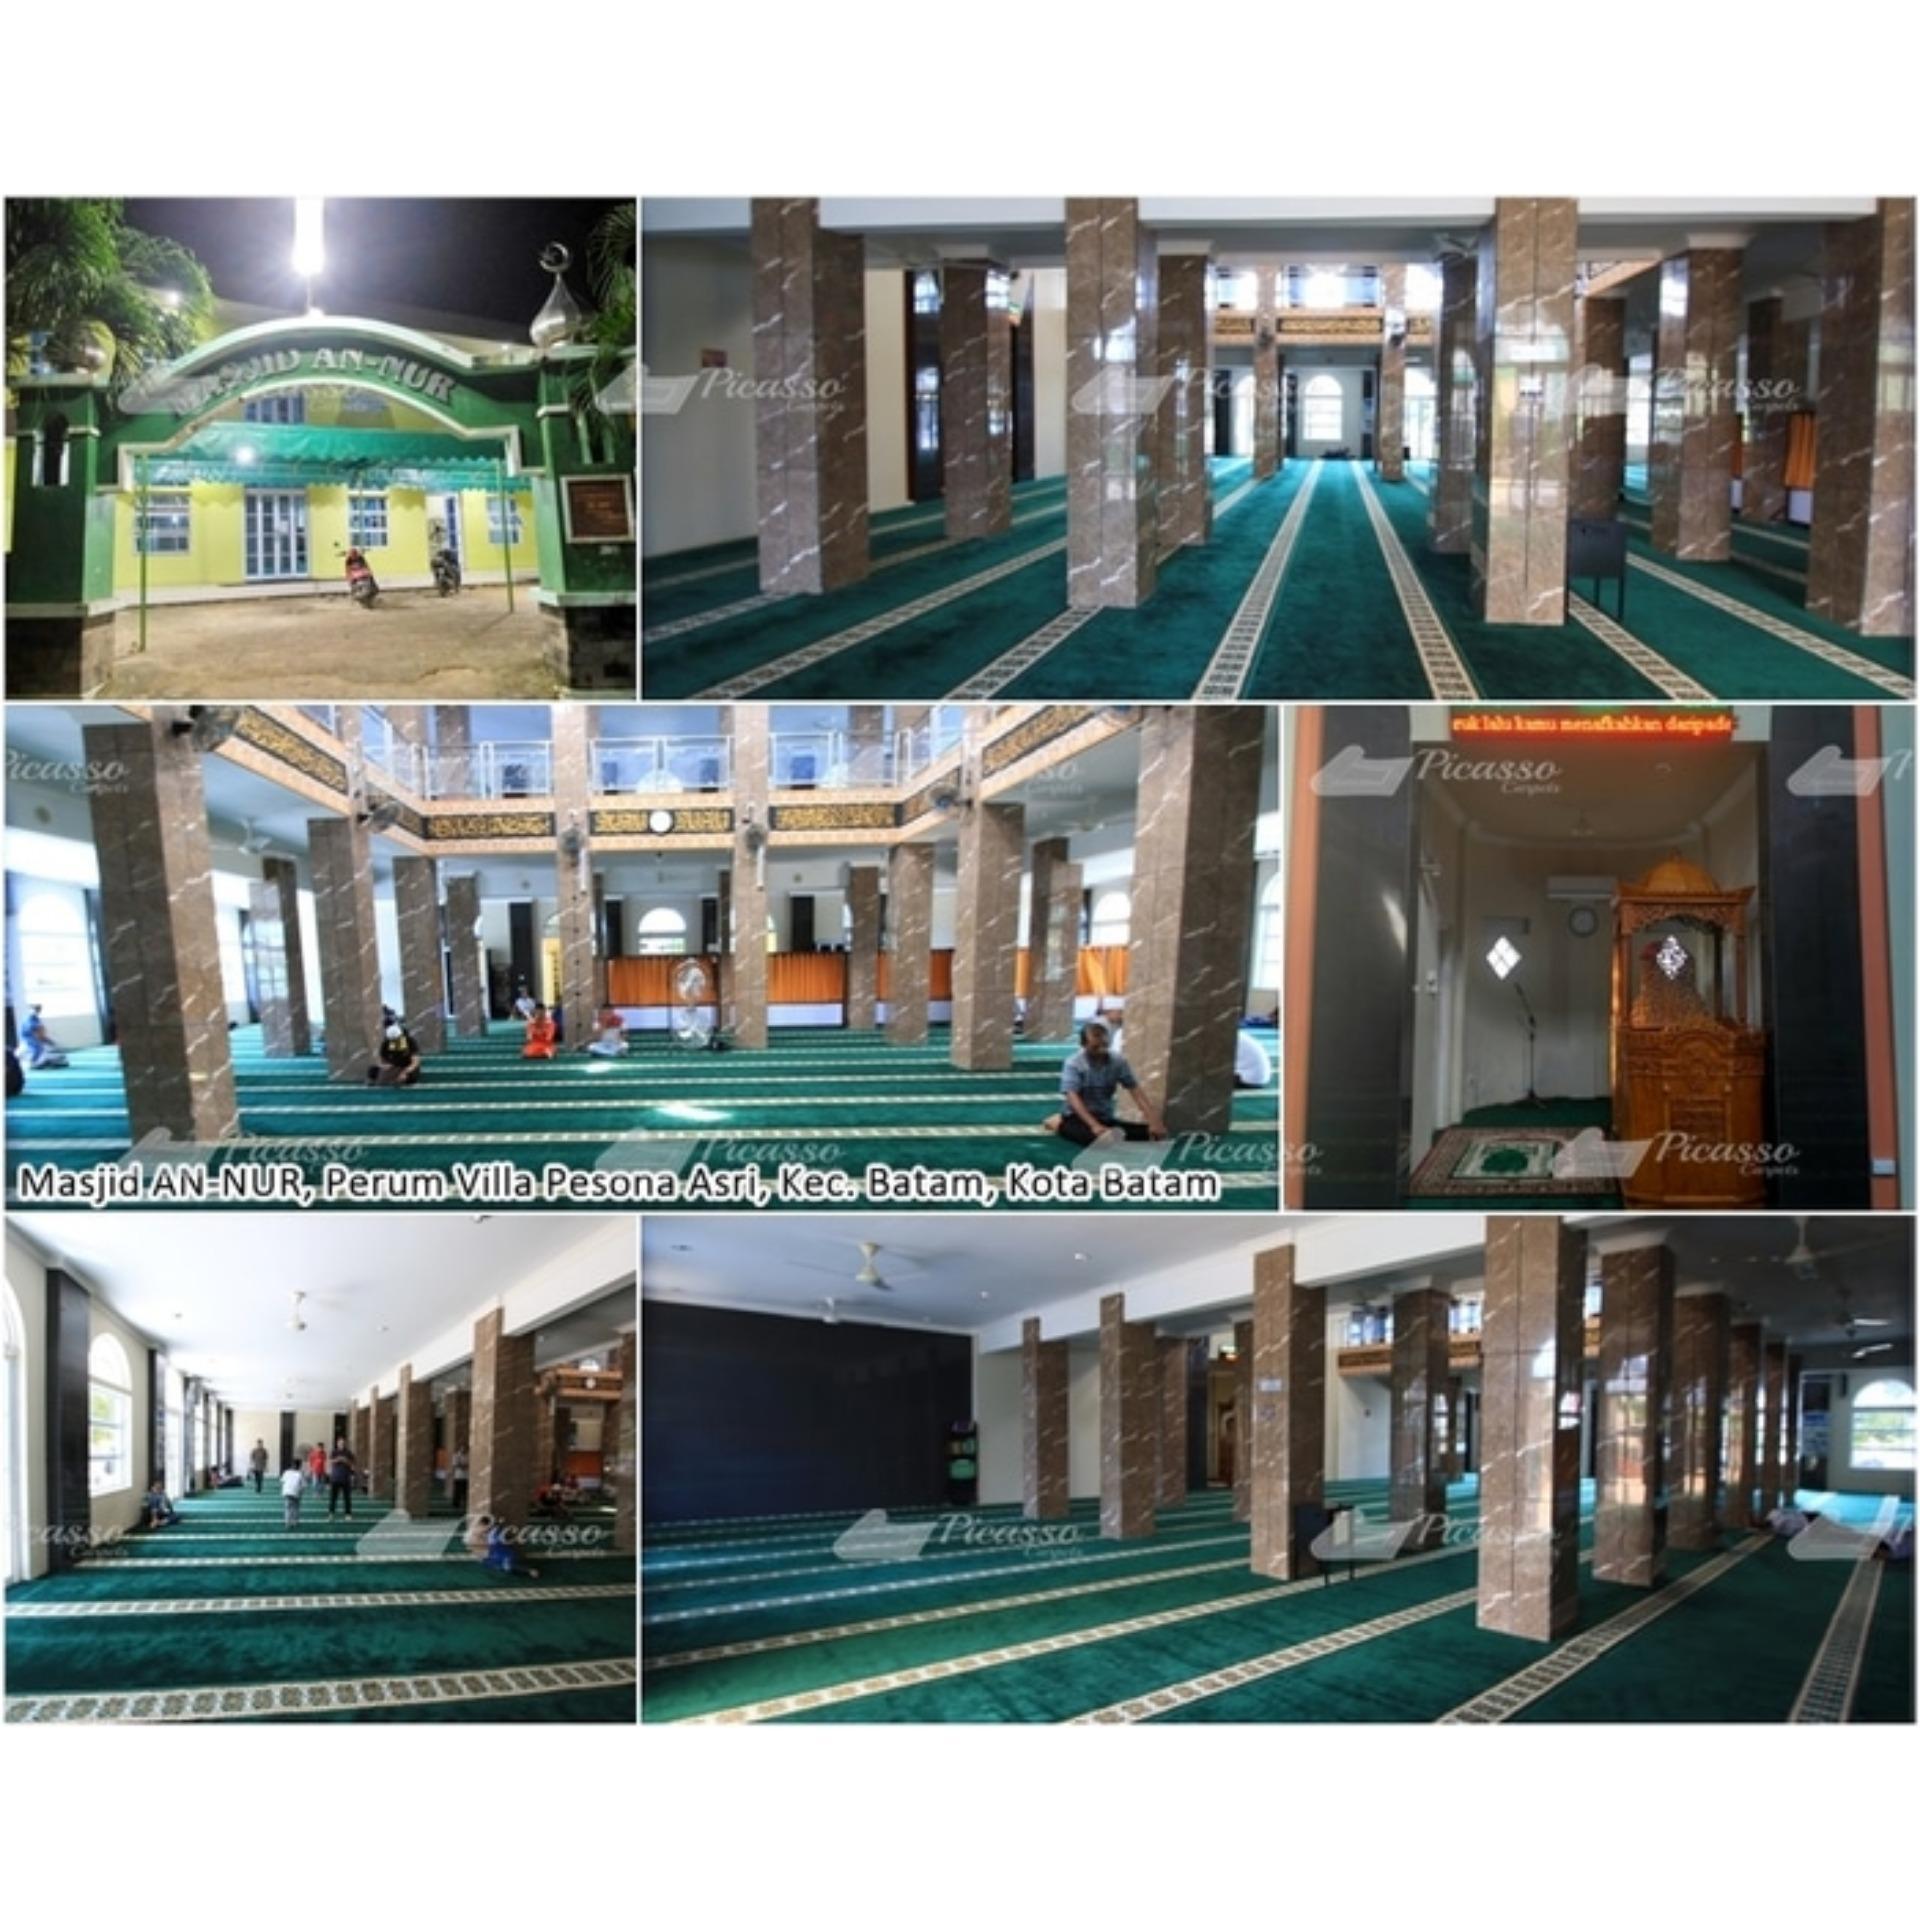 ... Medeena Masjid 21001 Roll Karpet Sajadah - Hijau [105 x 570 cm]. Source · Detail Gambar Sajadah Masjid Hijau Minimalis Kualitas Terbaik Terbaru